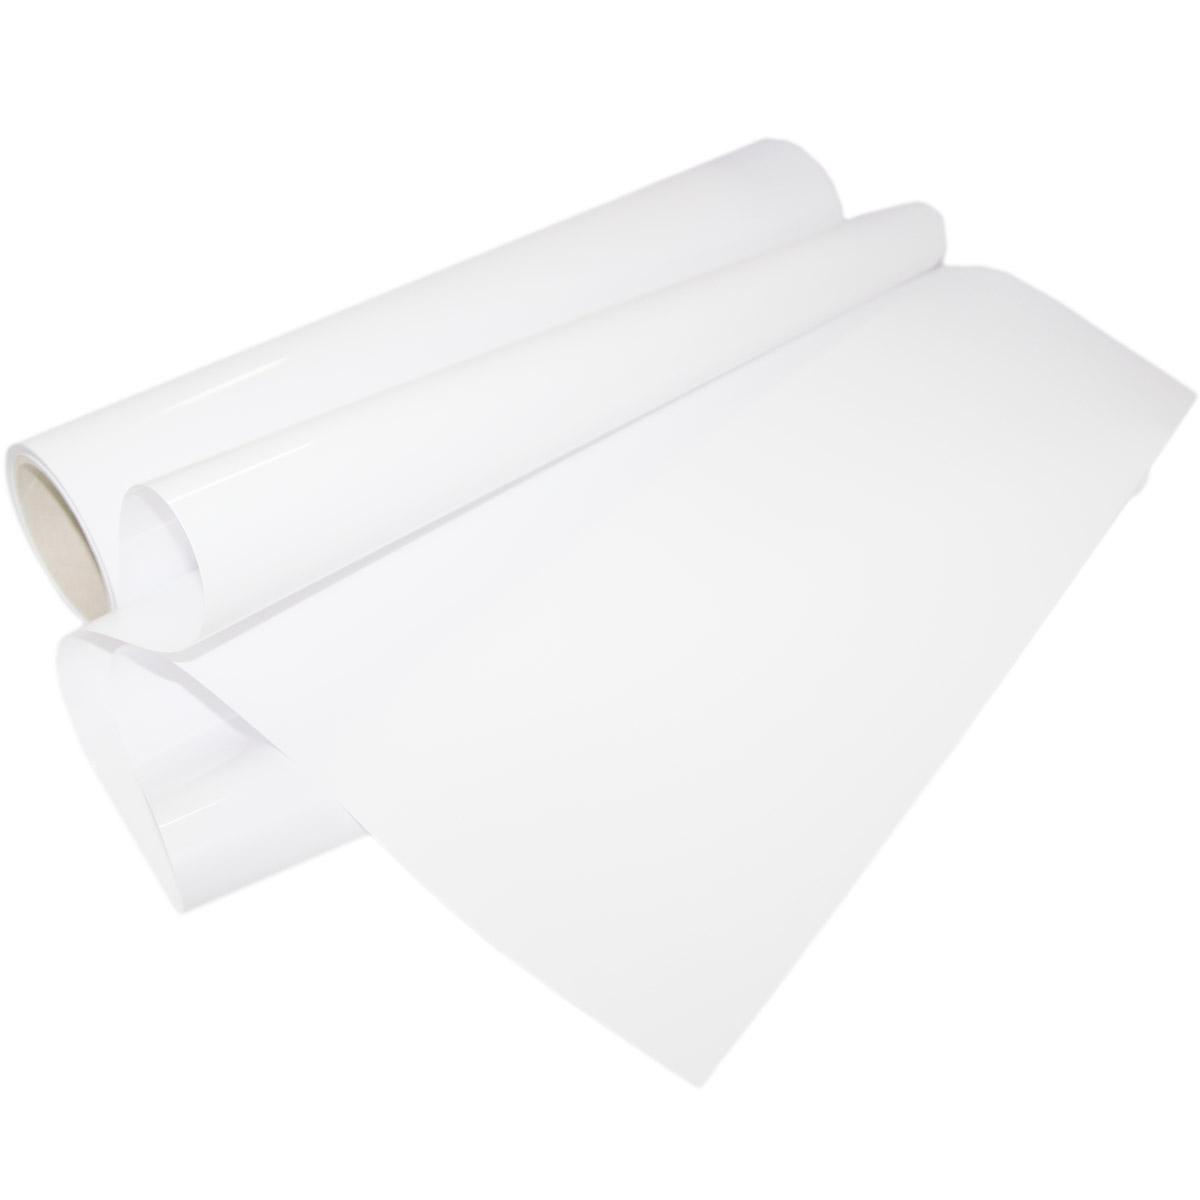 Easyprint SIR - Folia Flex Sublistop do druku solwentowego i lateksowego